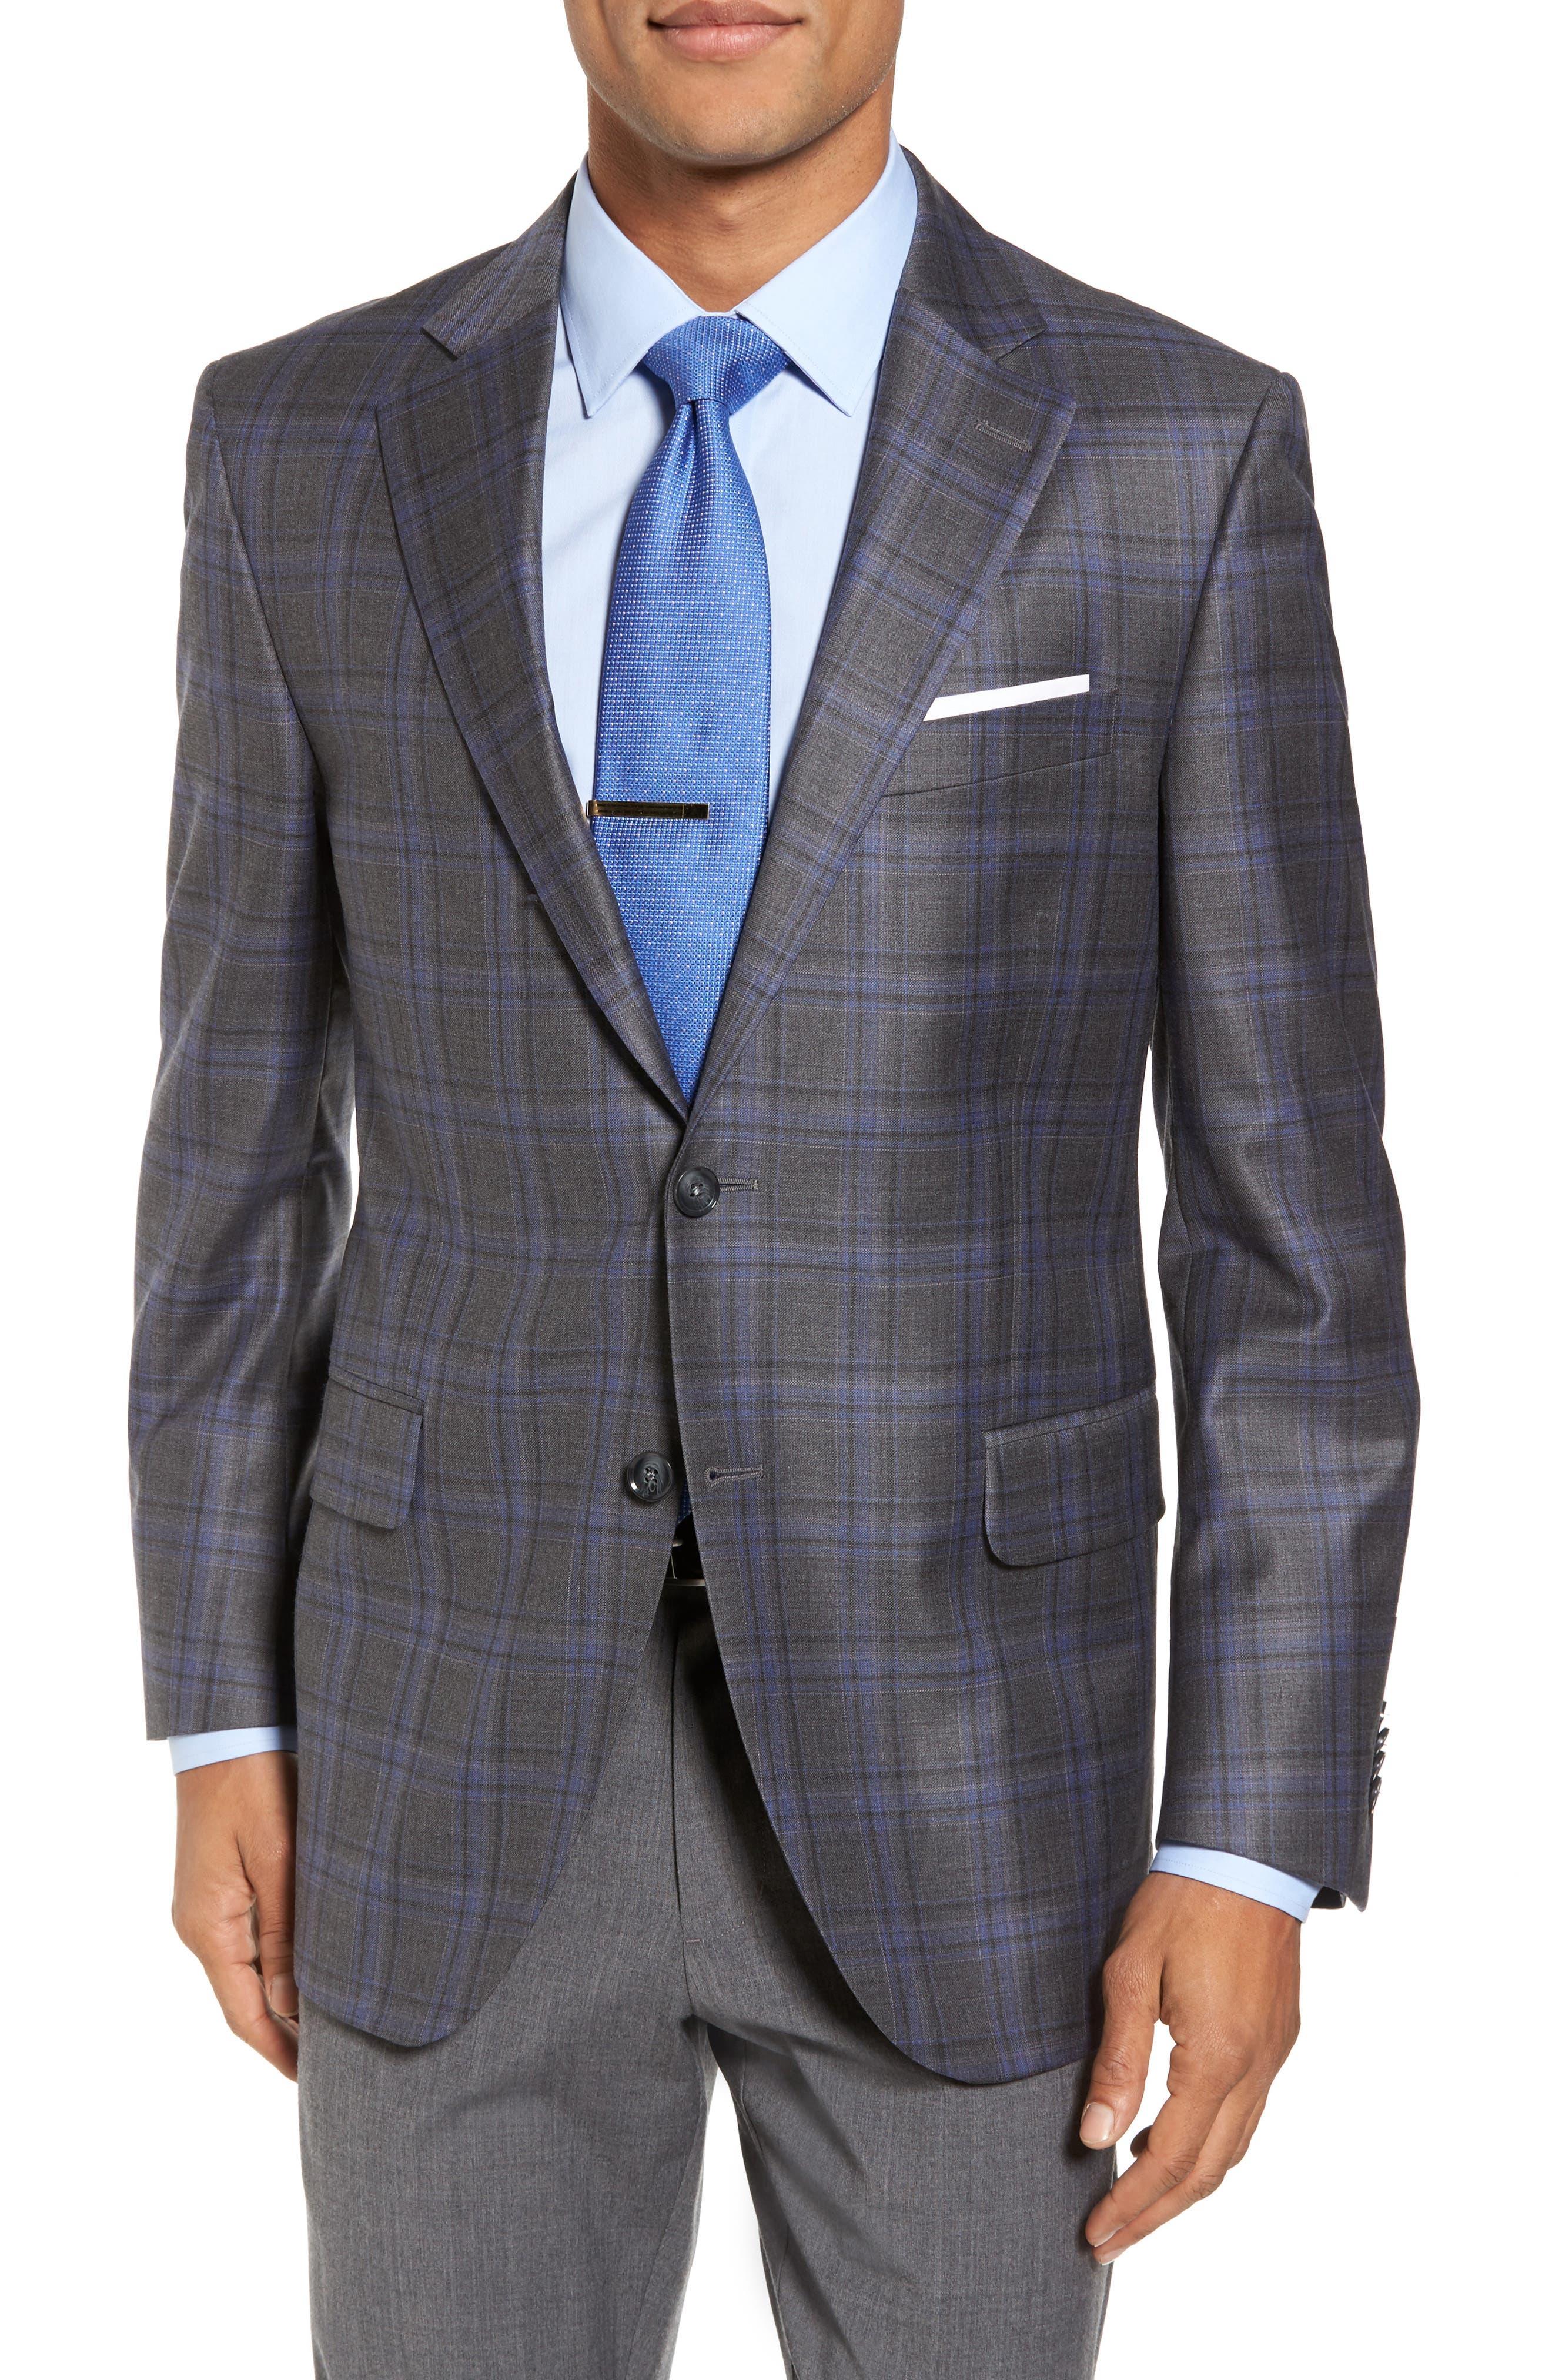 Alternate Image 1 Selected - Peter Millar Classic Fit Plaid Wool Sport Coat